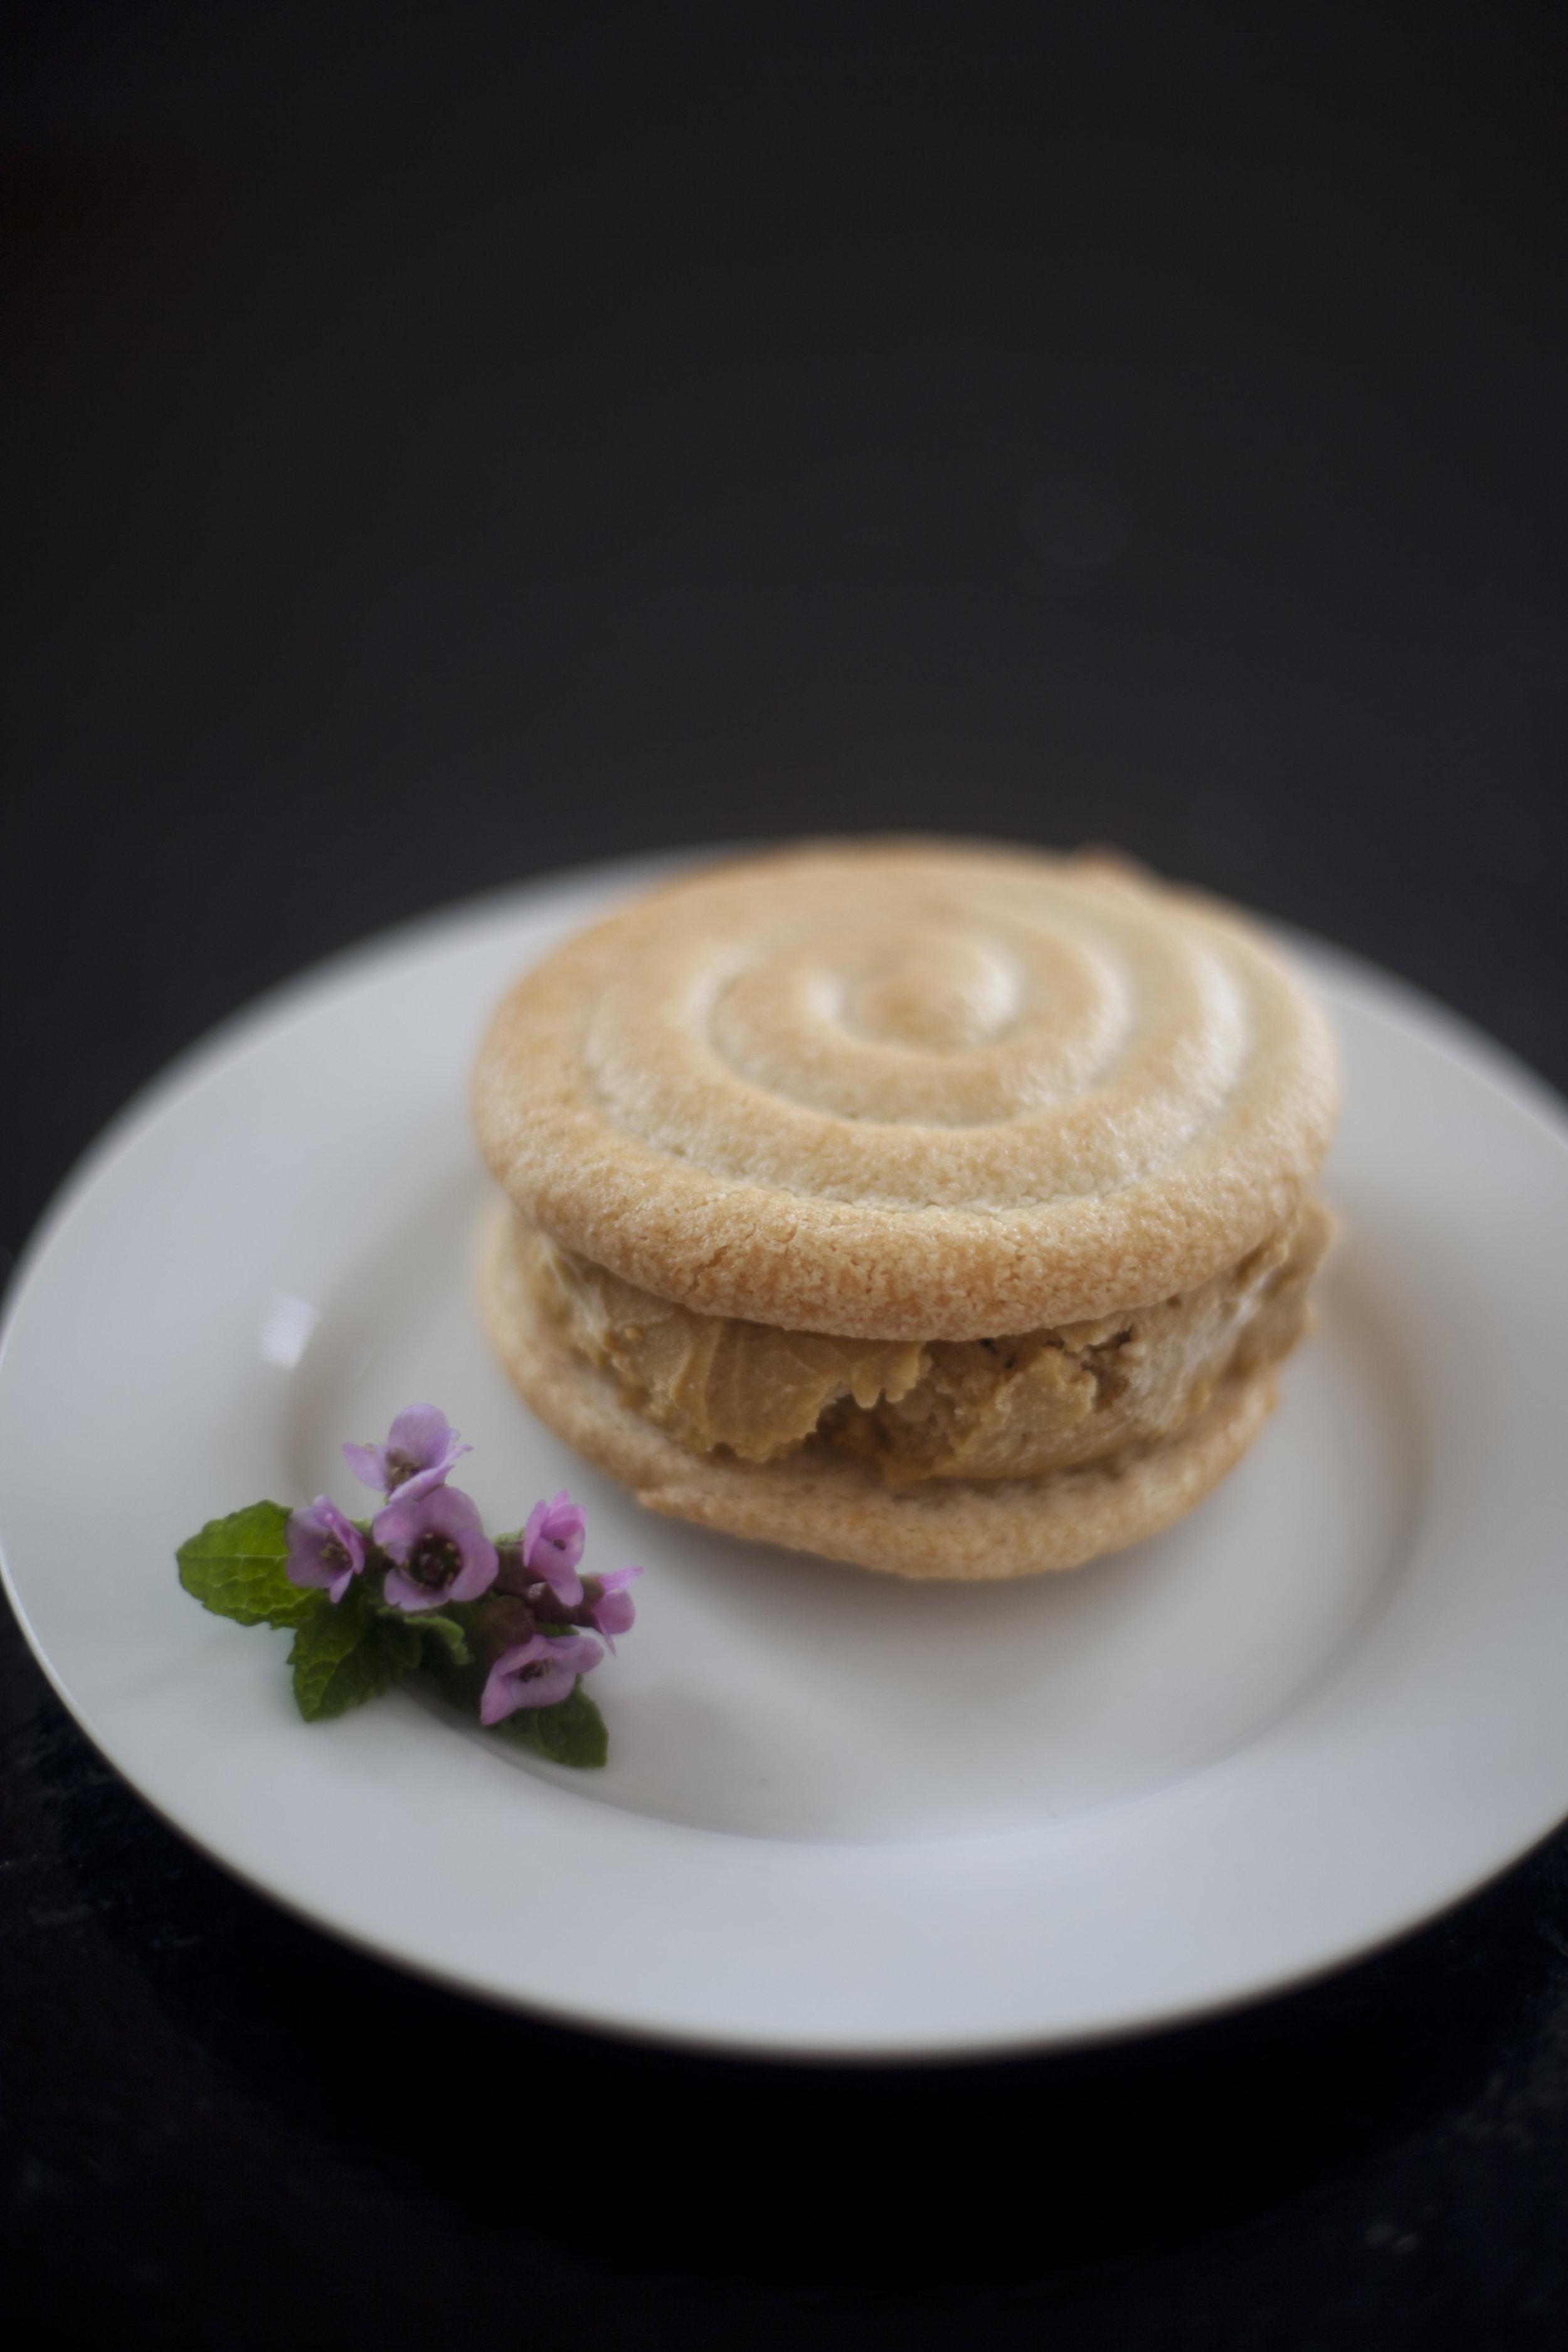 French Macaron Ice Cream Sandwich